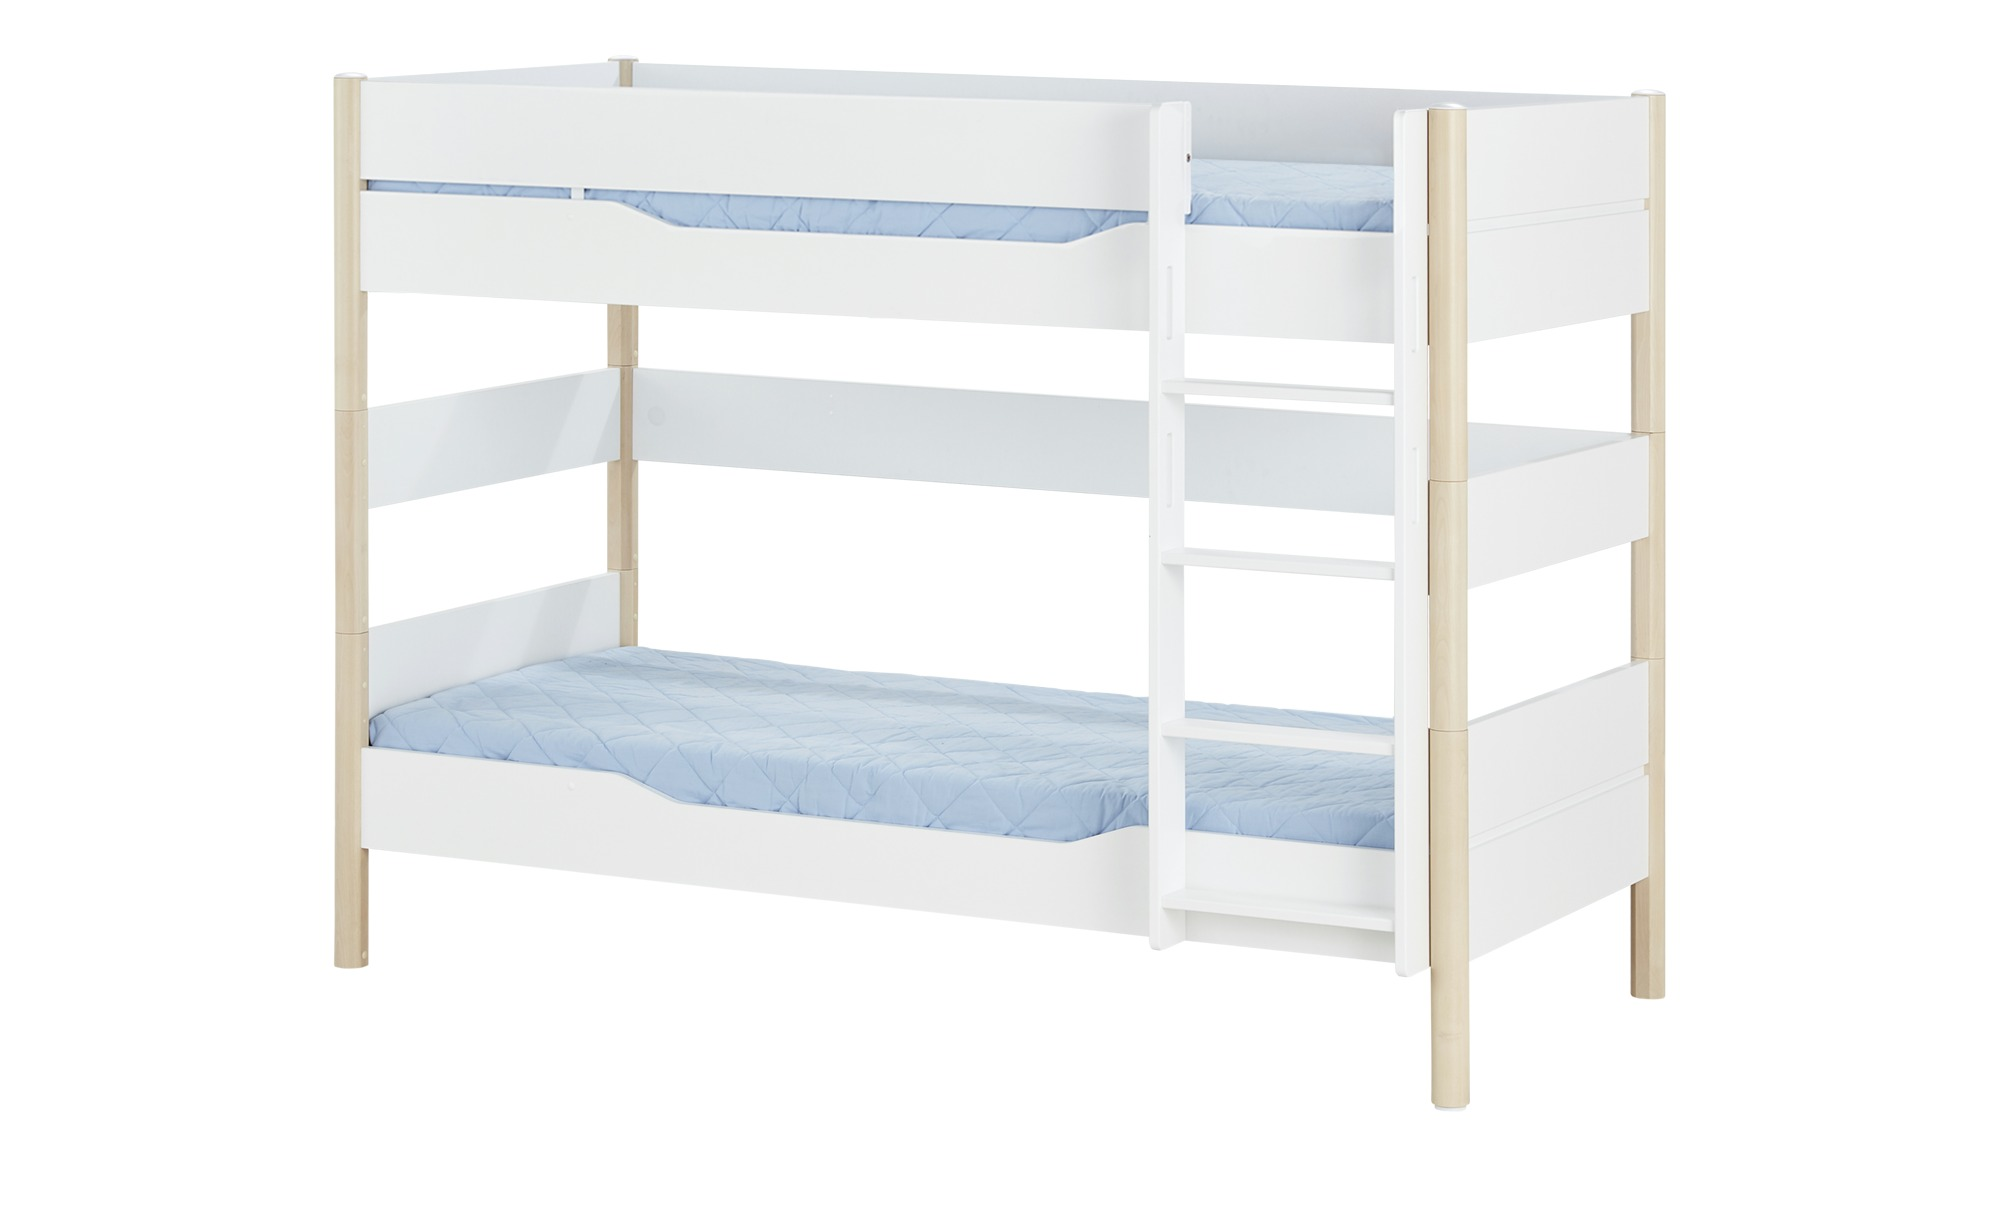 Pin By Ladendirekt On Kinderbetten Bunk Beds Home Decor Bed